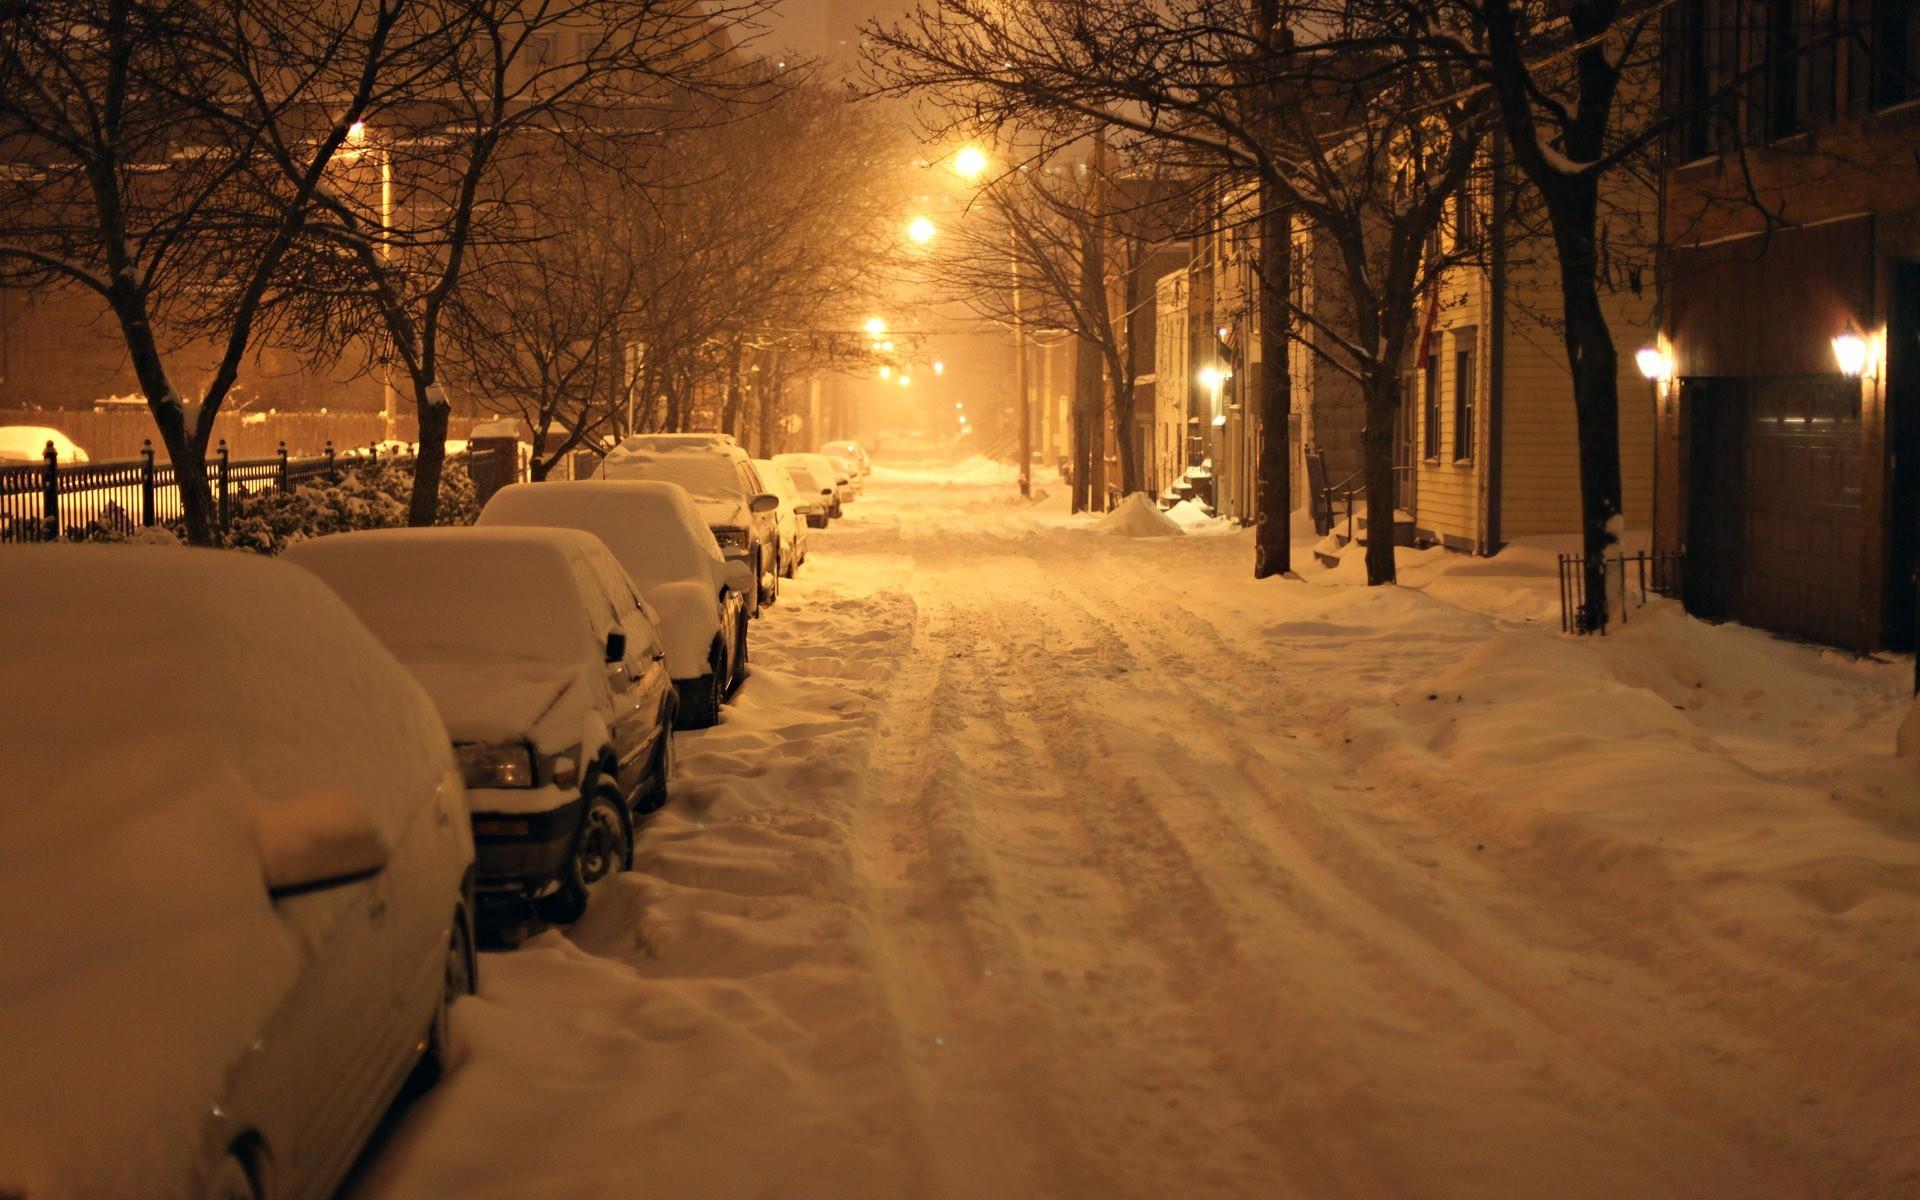 General 1920x1200 car snow photography night winter street city urban street light lantern vehicle house calm